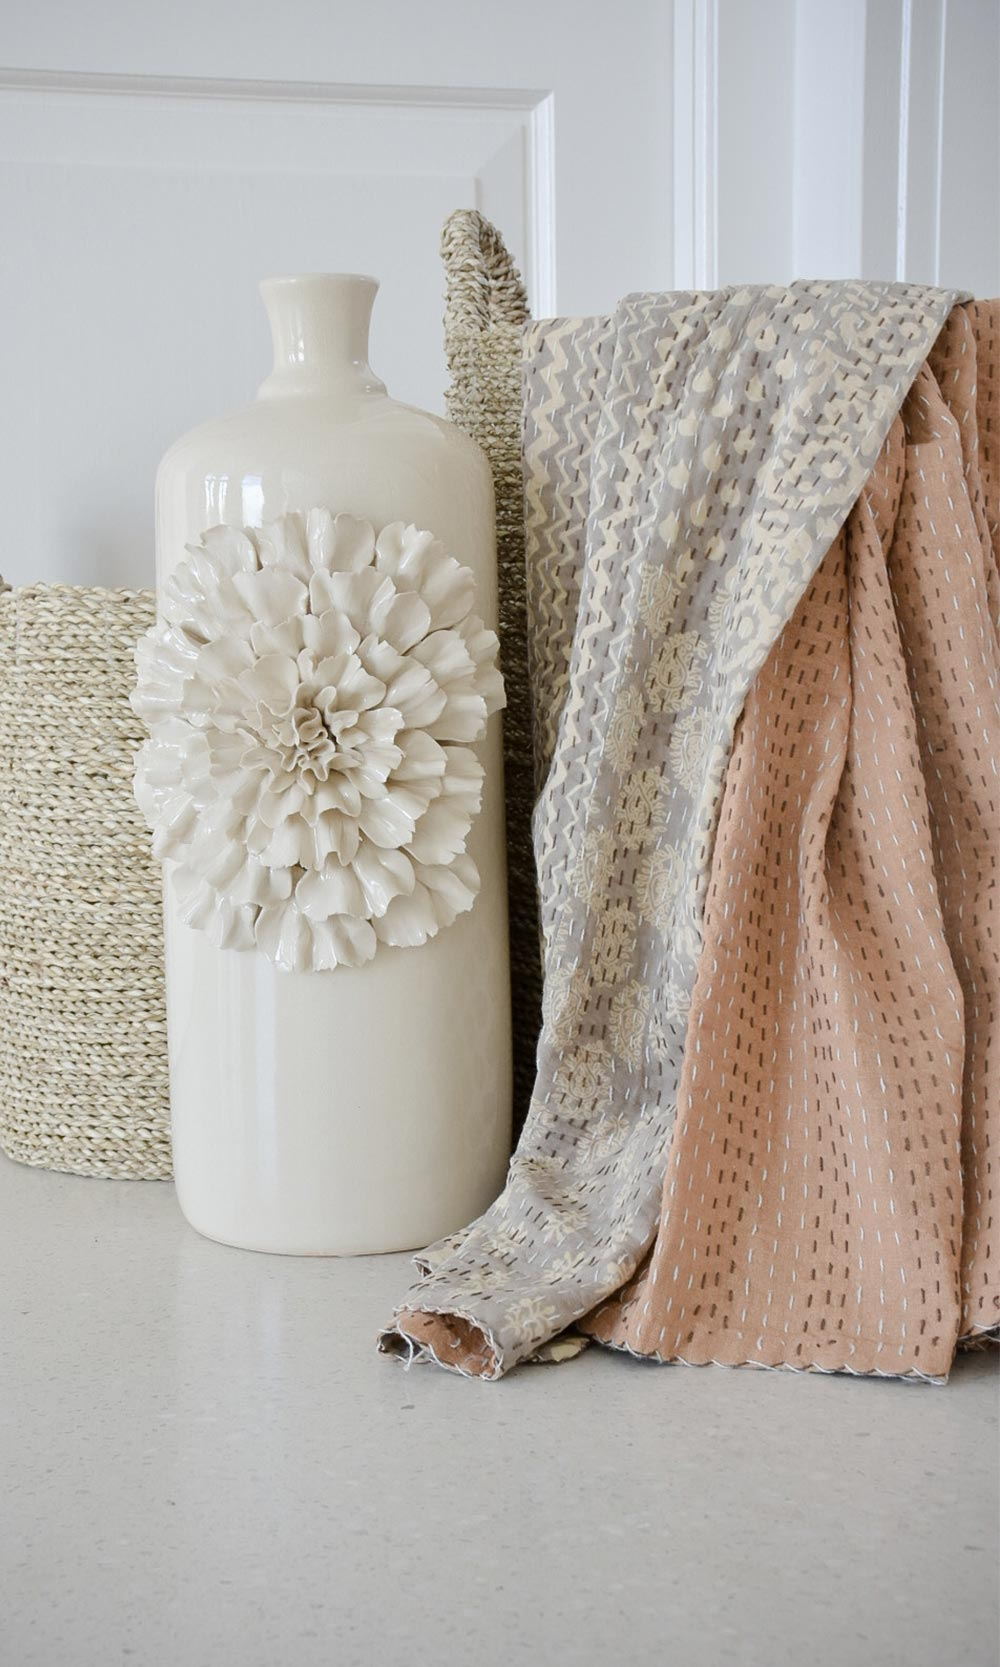 Cream Cappuccino Block Printed Indian Cotton Kantha Throw